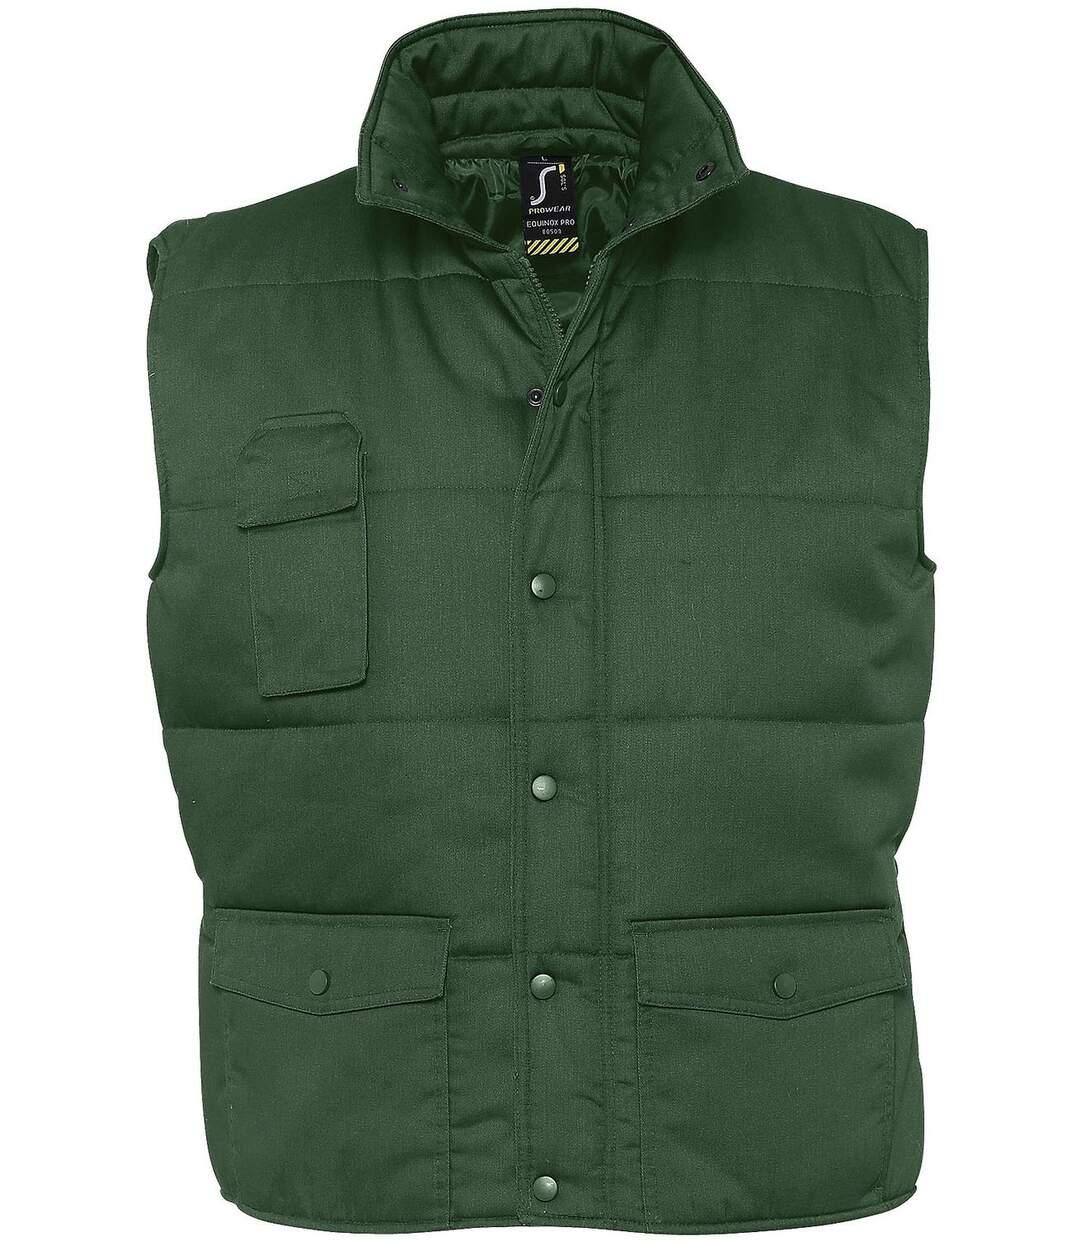 Veste sans manches matelassée - bodywarmer workwear - PRO 80503 - vert